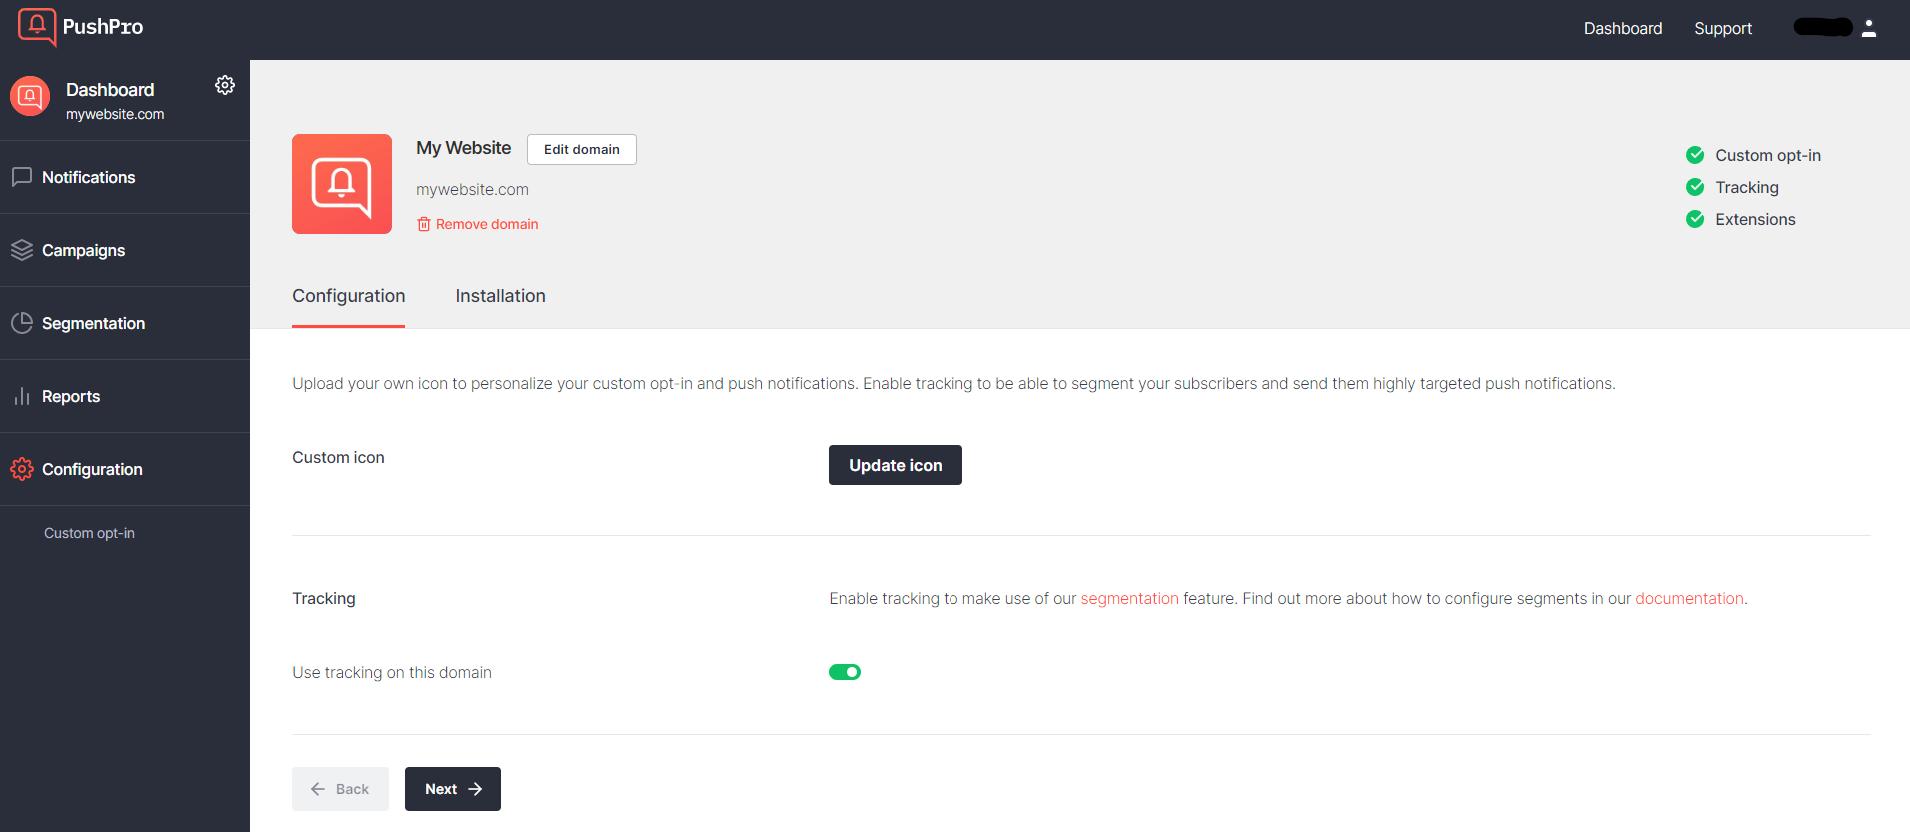 Screenshot of the domain edit settings in the PushPro portal